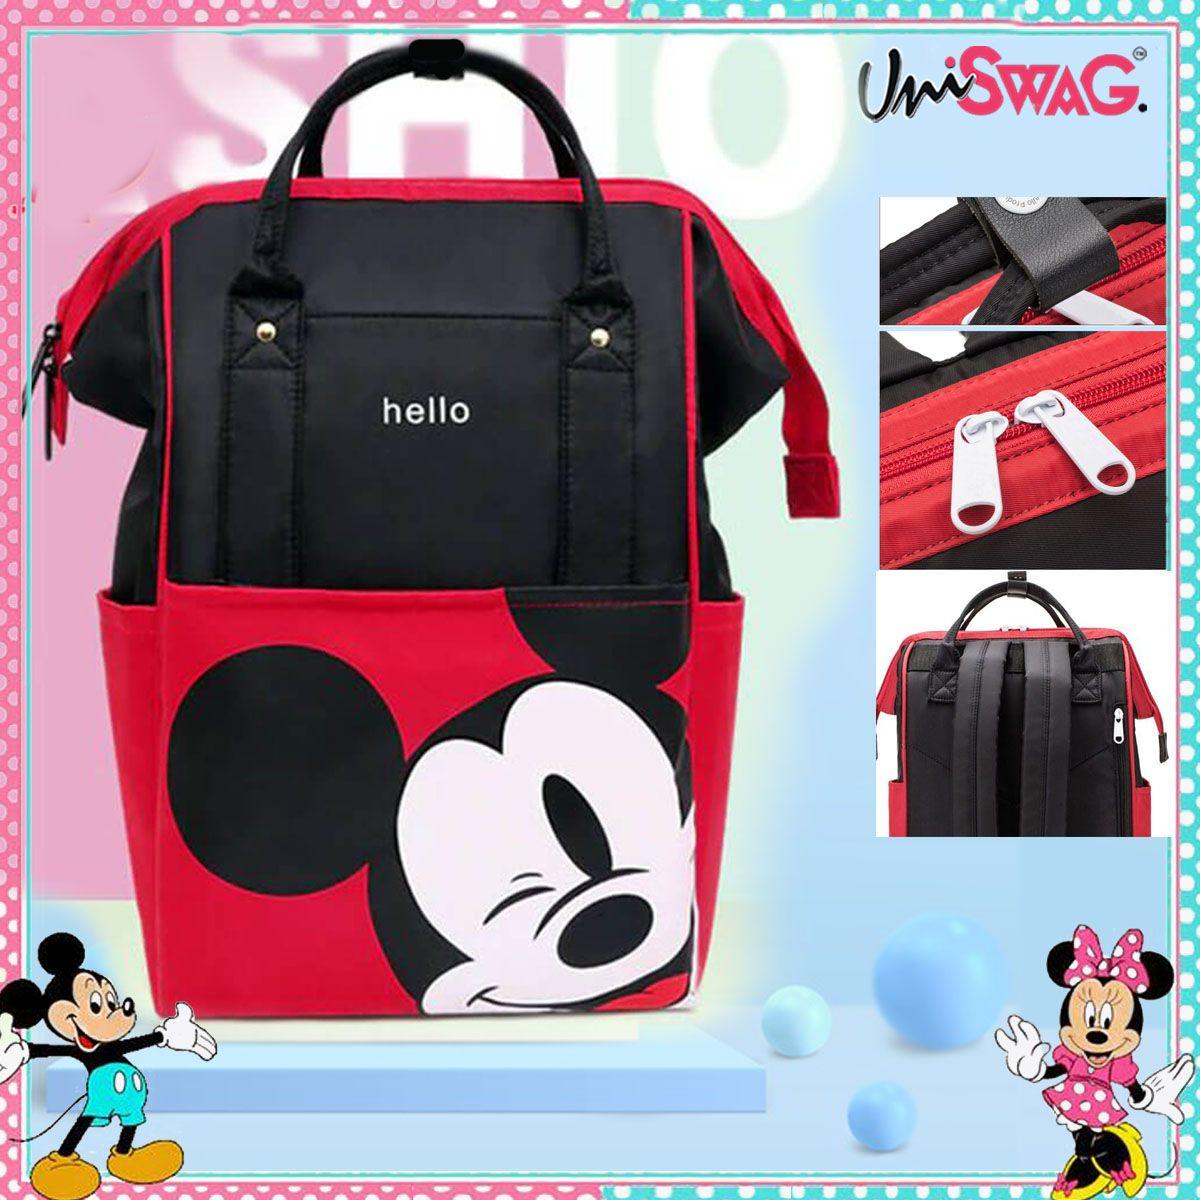 Baby Diaper Bag & Accessories BackPack - Mummy Bag Multi-Function Waterproof - Travel Backpack